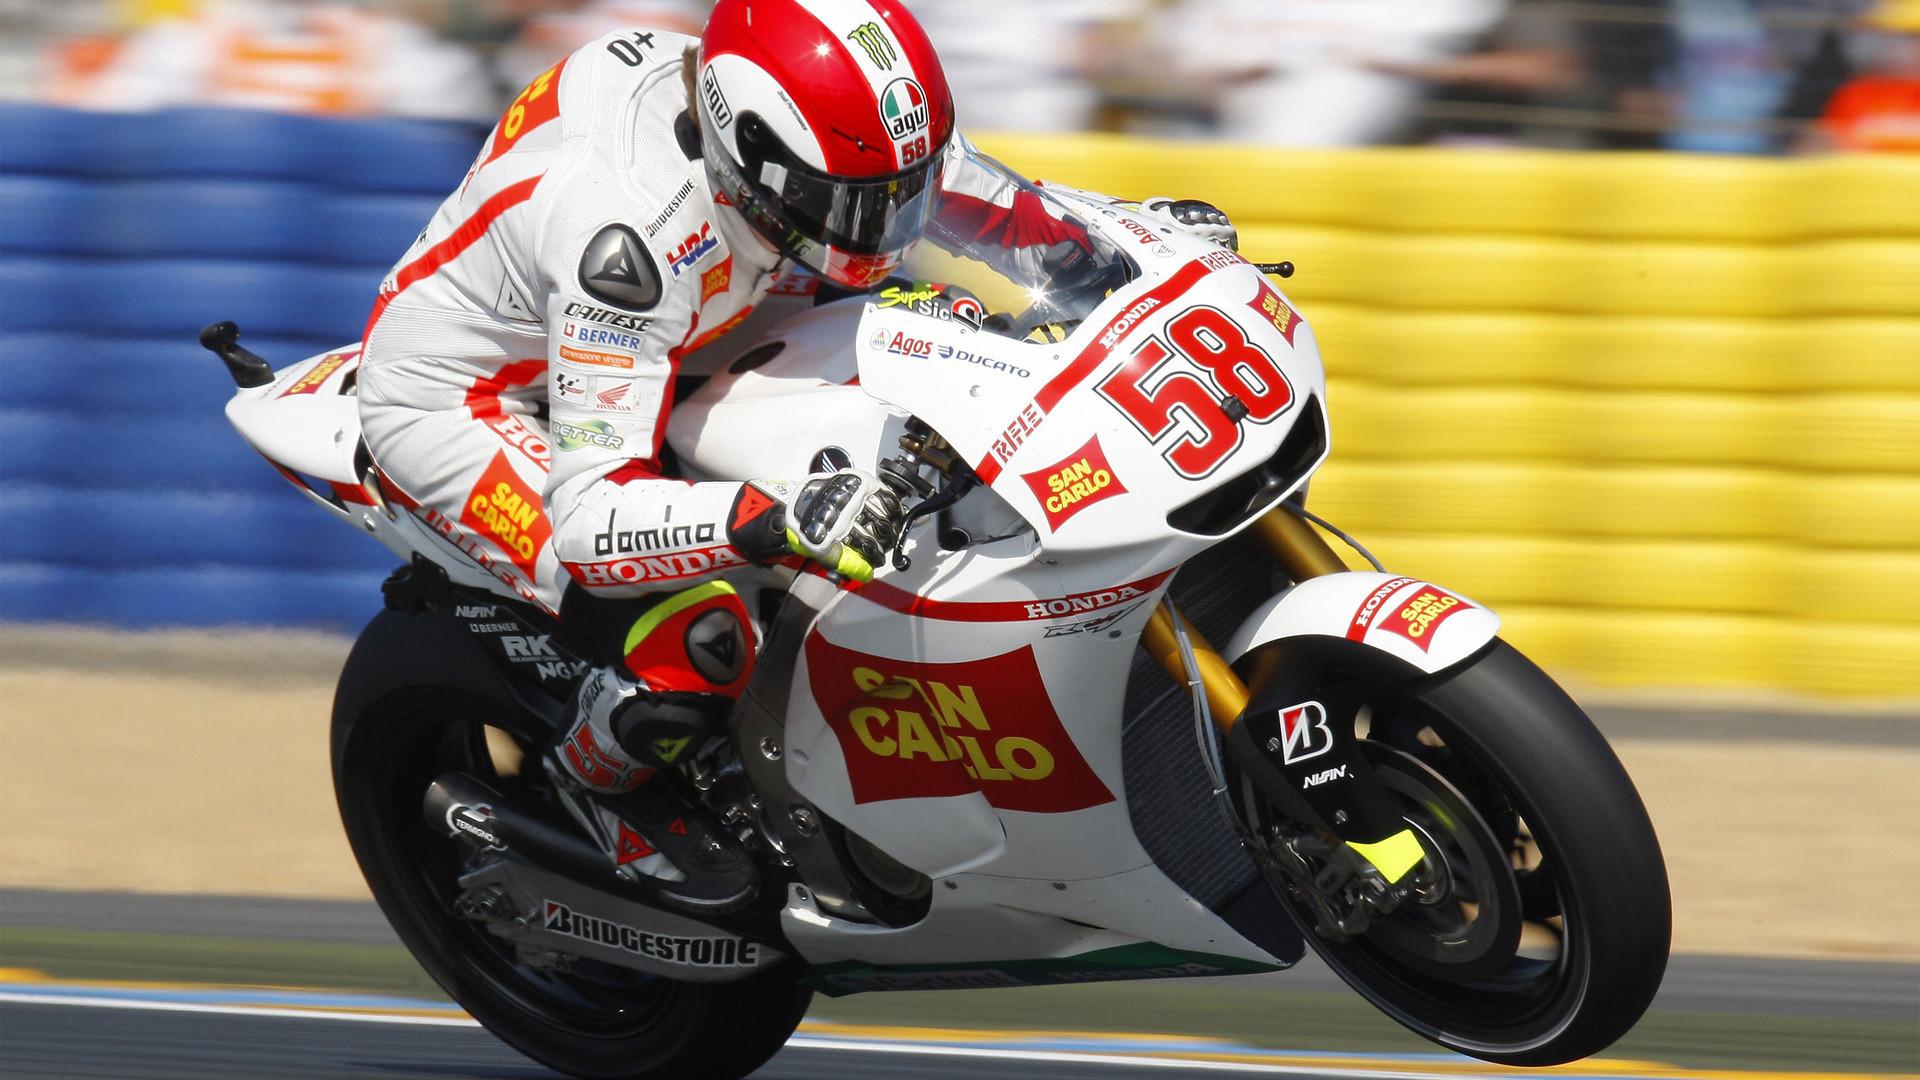 MotoGP Wallpaper HD 1080p